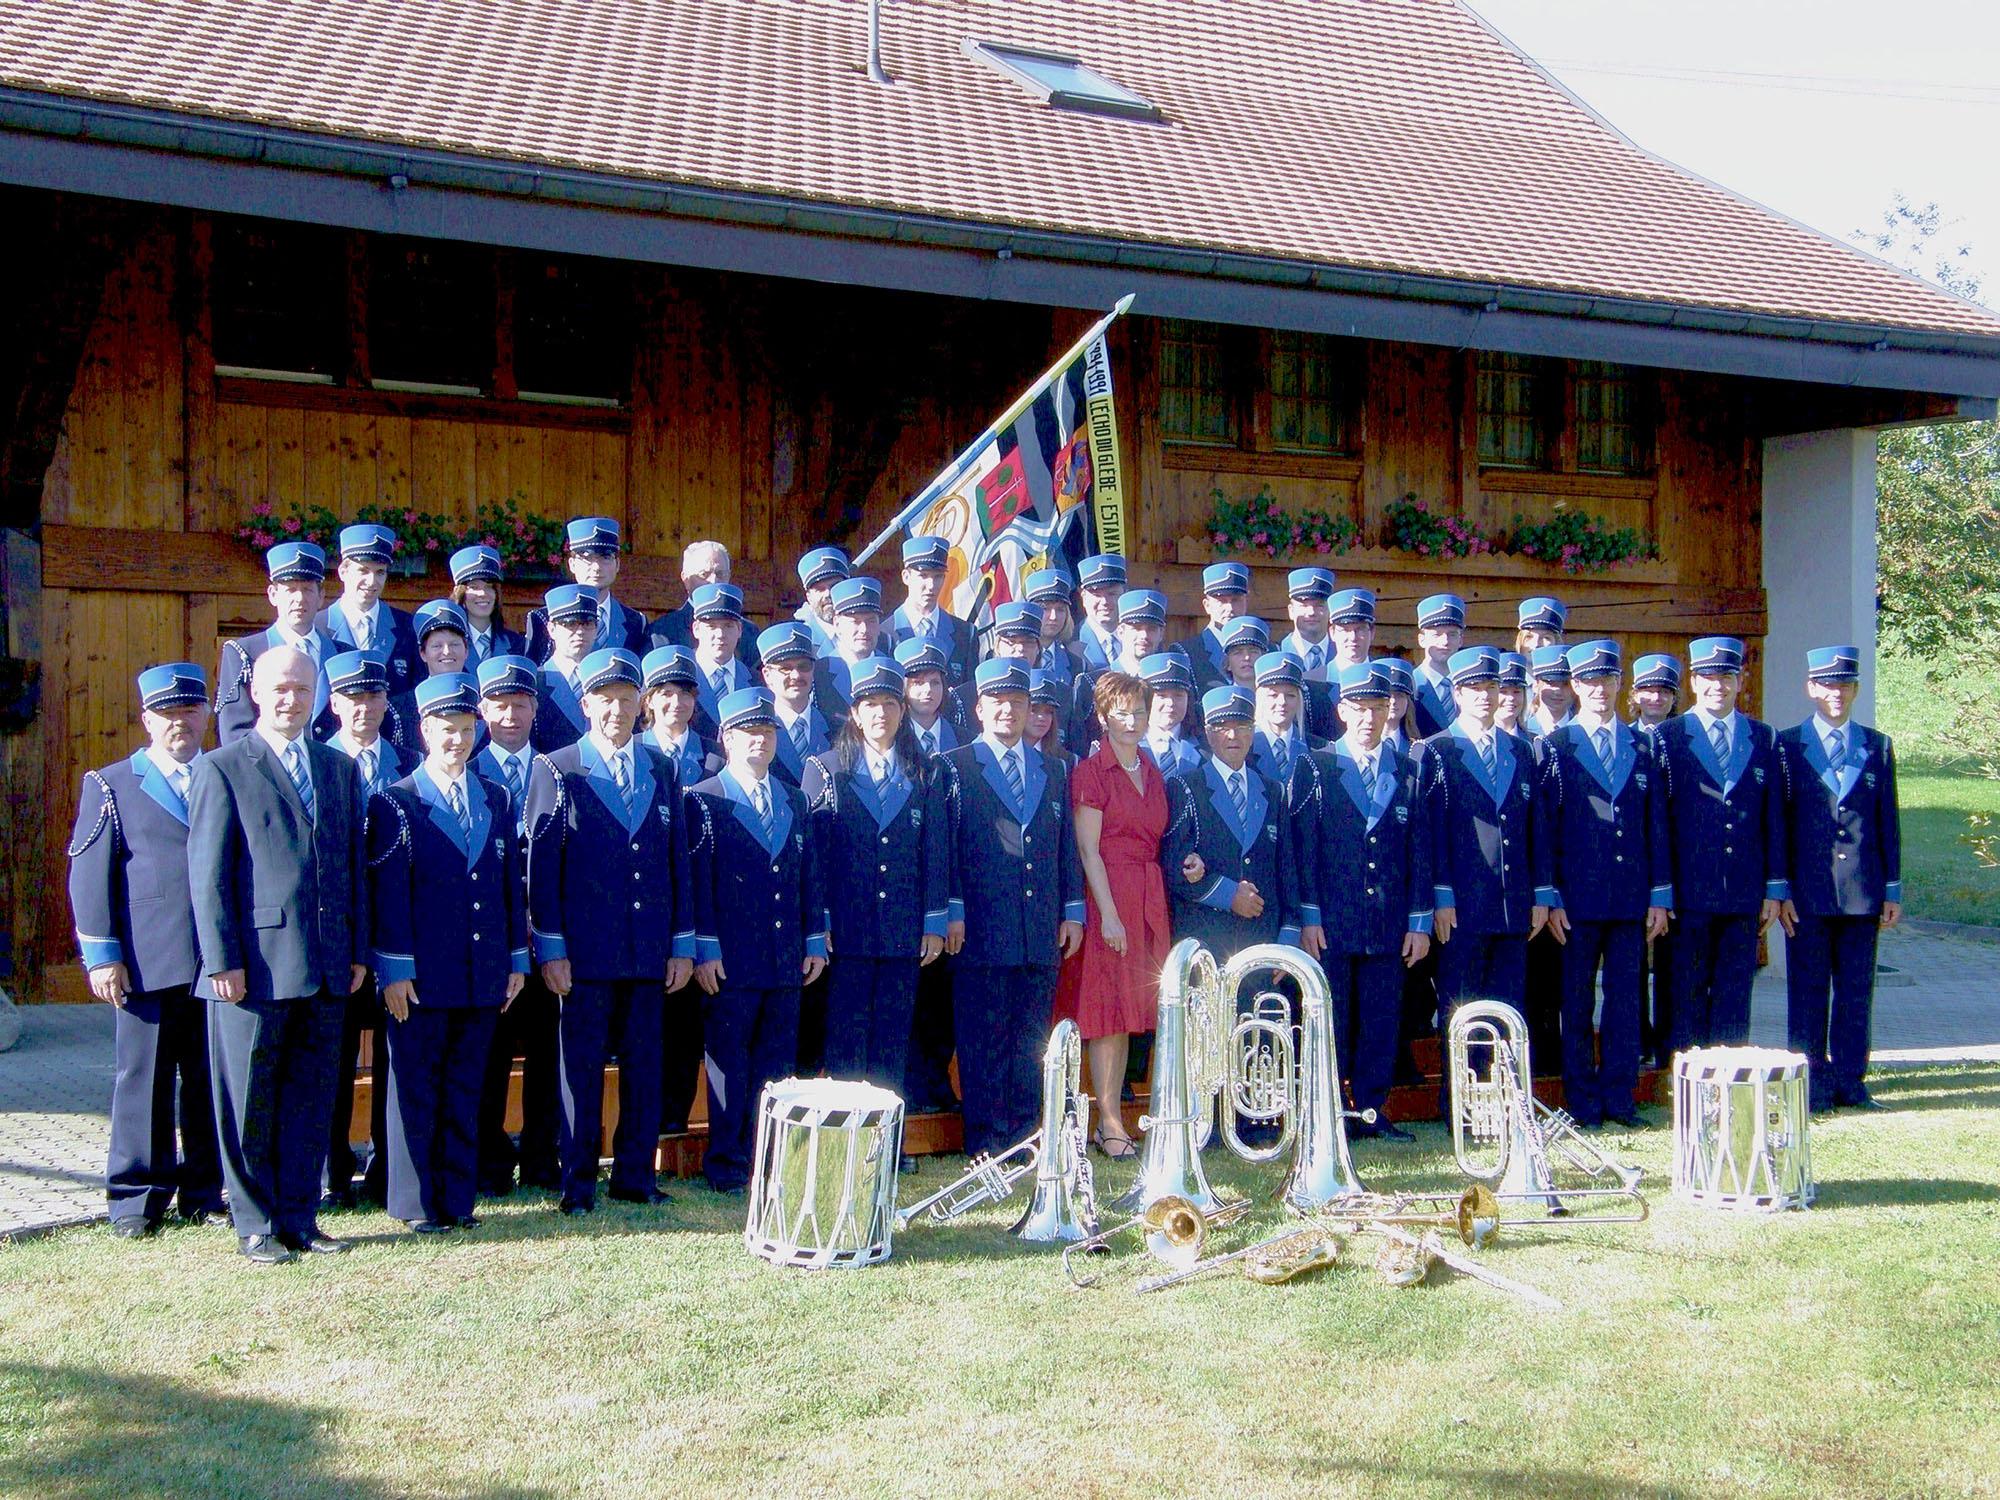 Inauguration des uniformes 2009